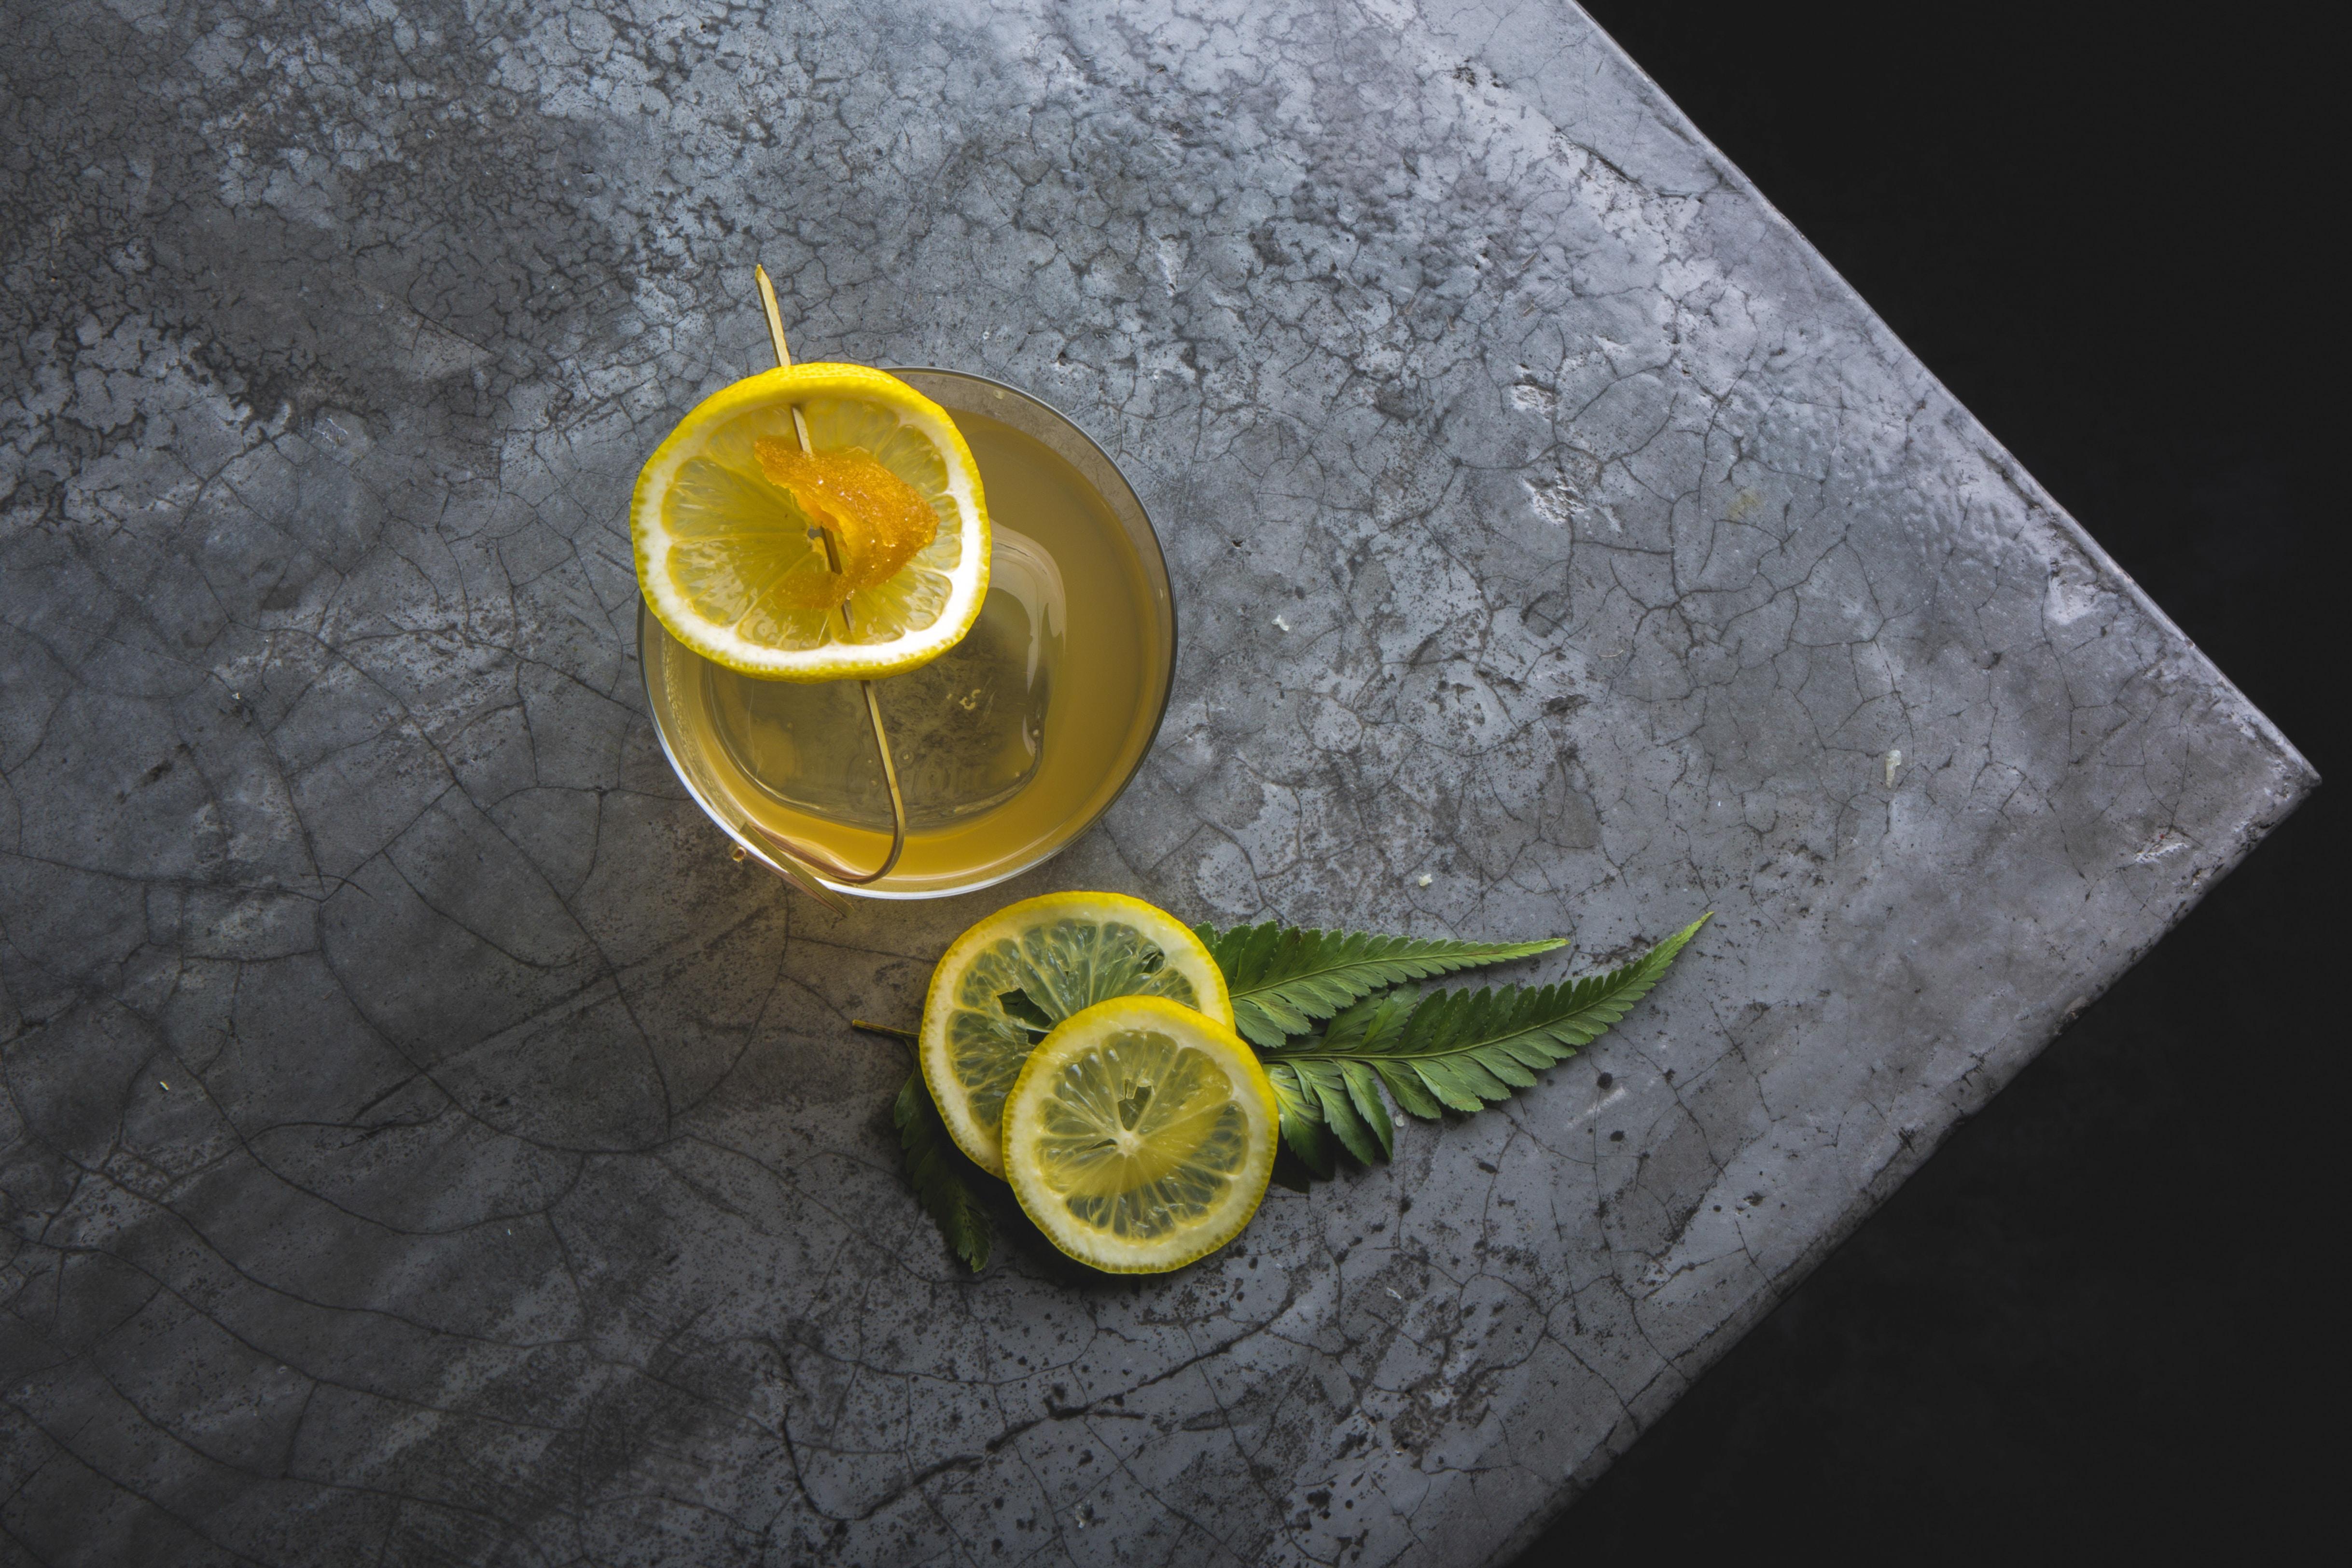 three lemon slice near glass on gray surface